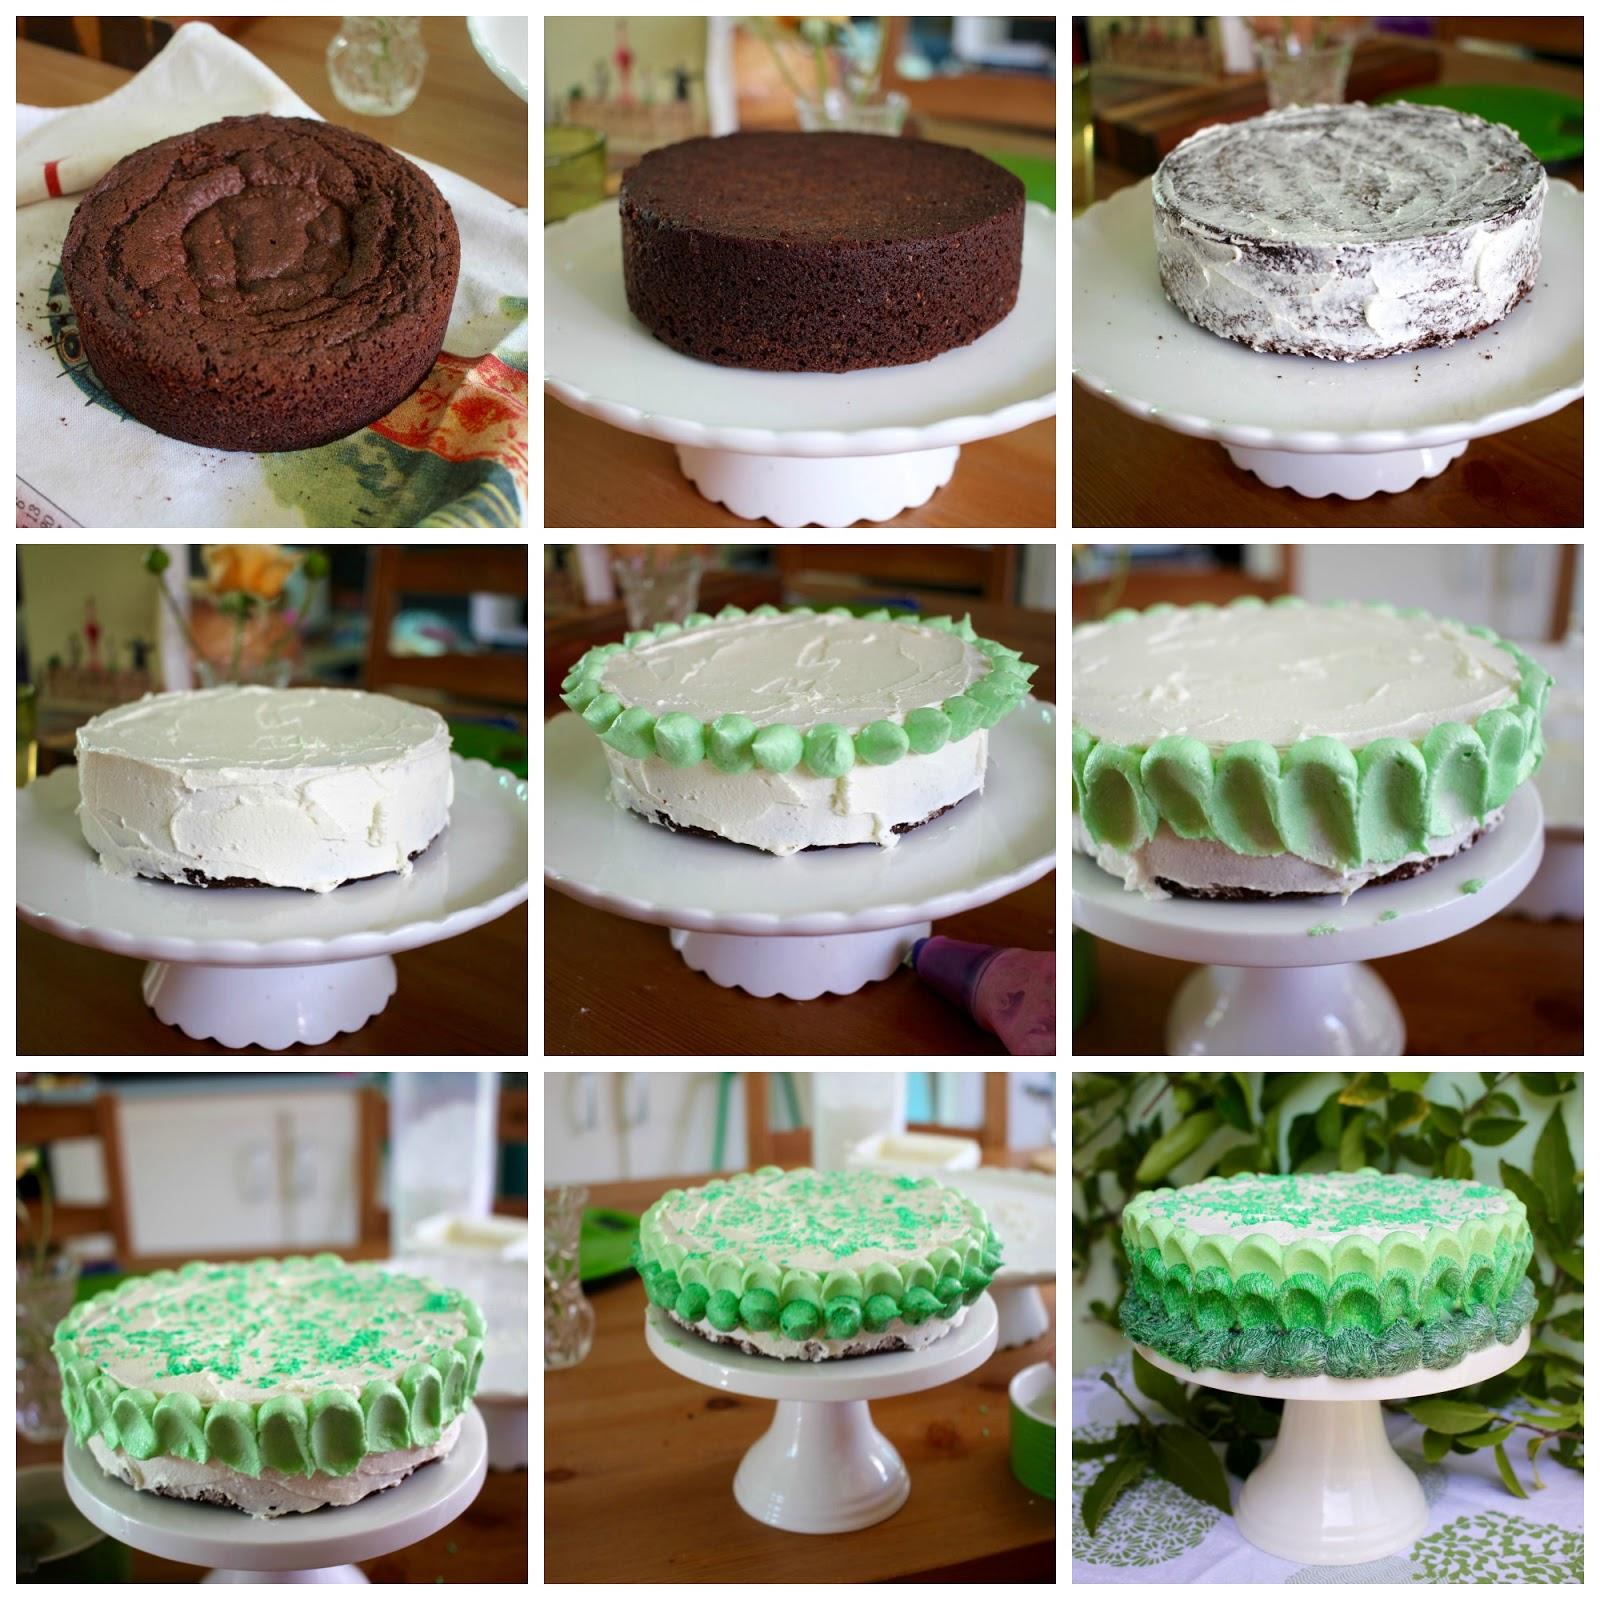 Green Gourmet Giraffe: Green ombre chocolate cake ...